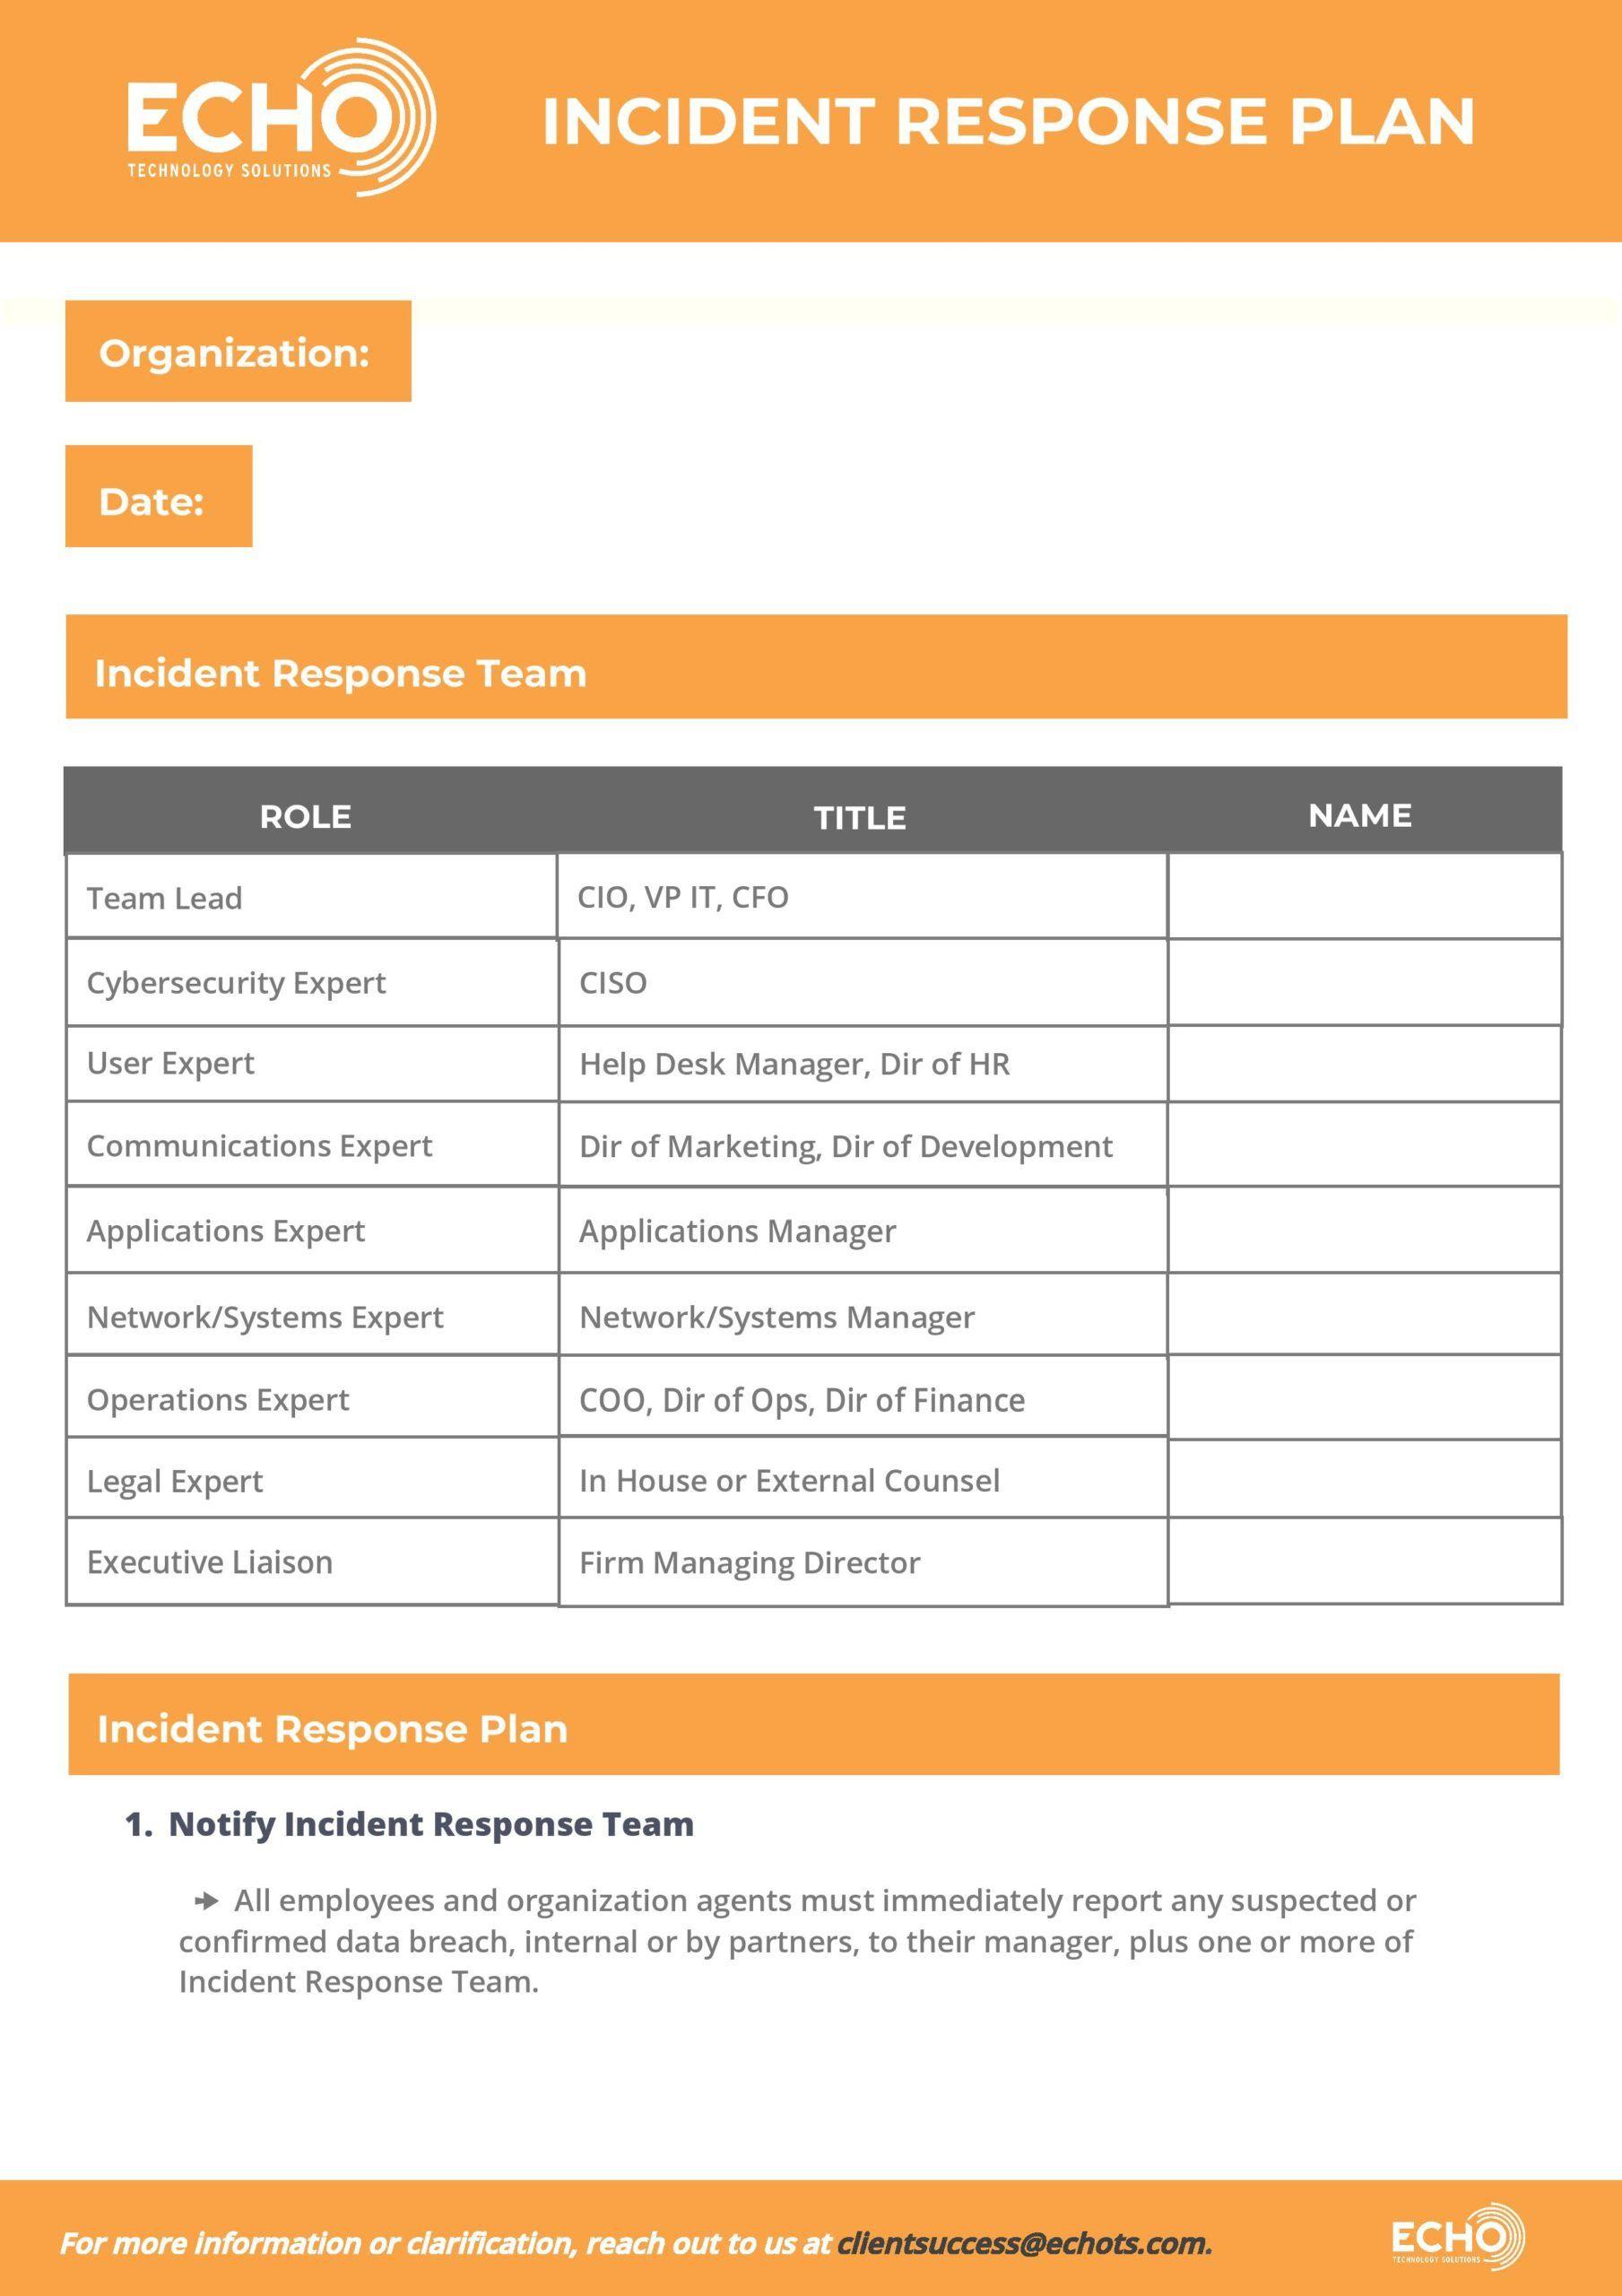 008 Singular Security Incident Response Plan Template High Resolution  Hipaa Pci NistFull